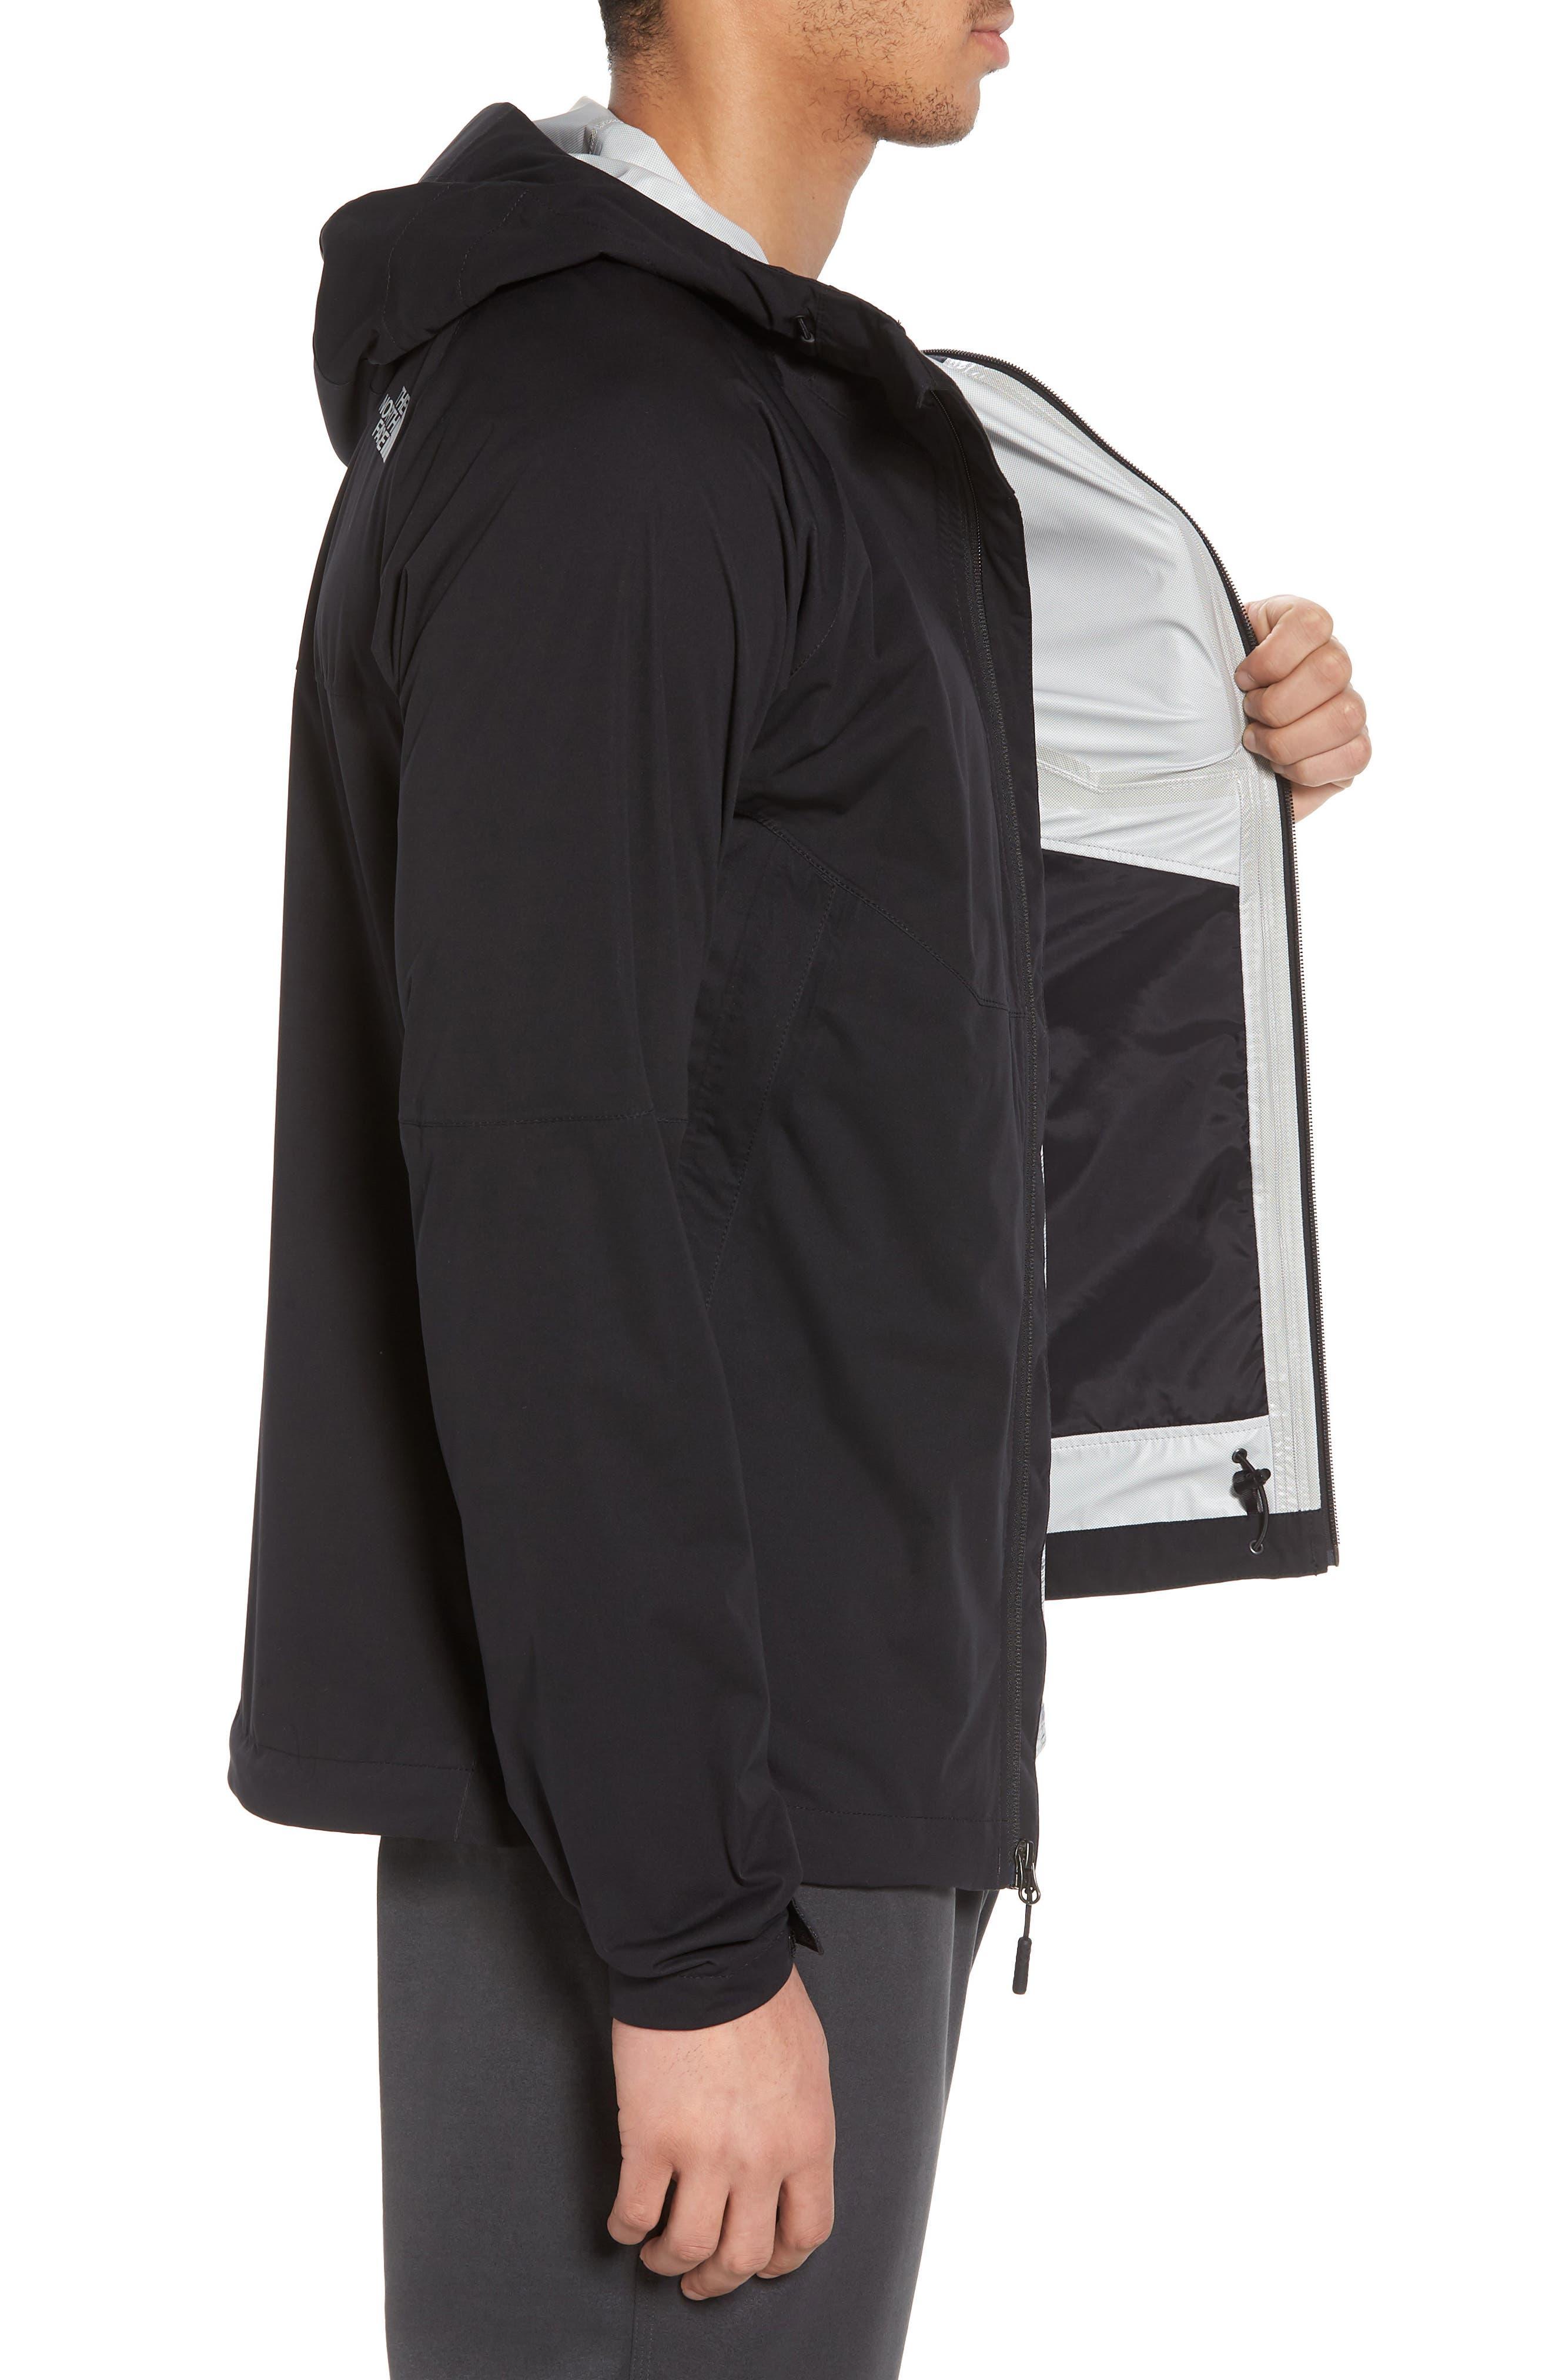 Allproof Stretch Hooded Rain Jacket,                             Alternate thumbnail 3, color,                             TNF BLACK